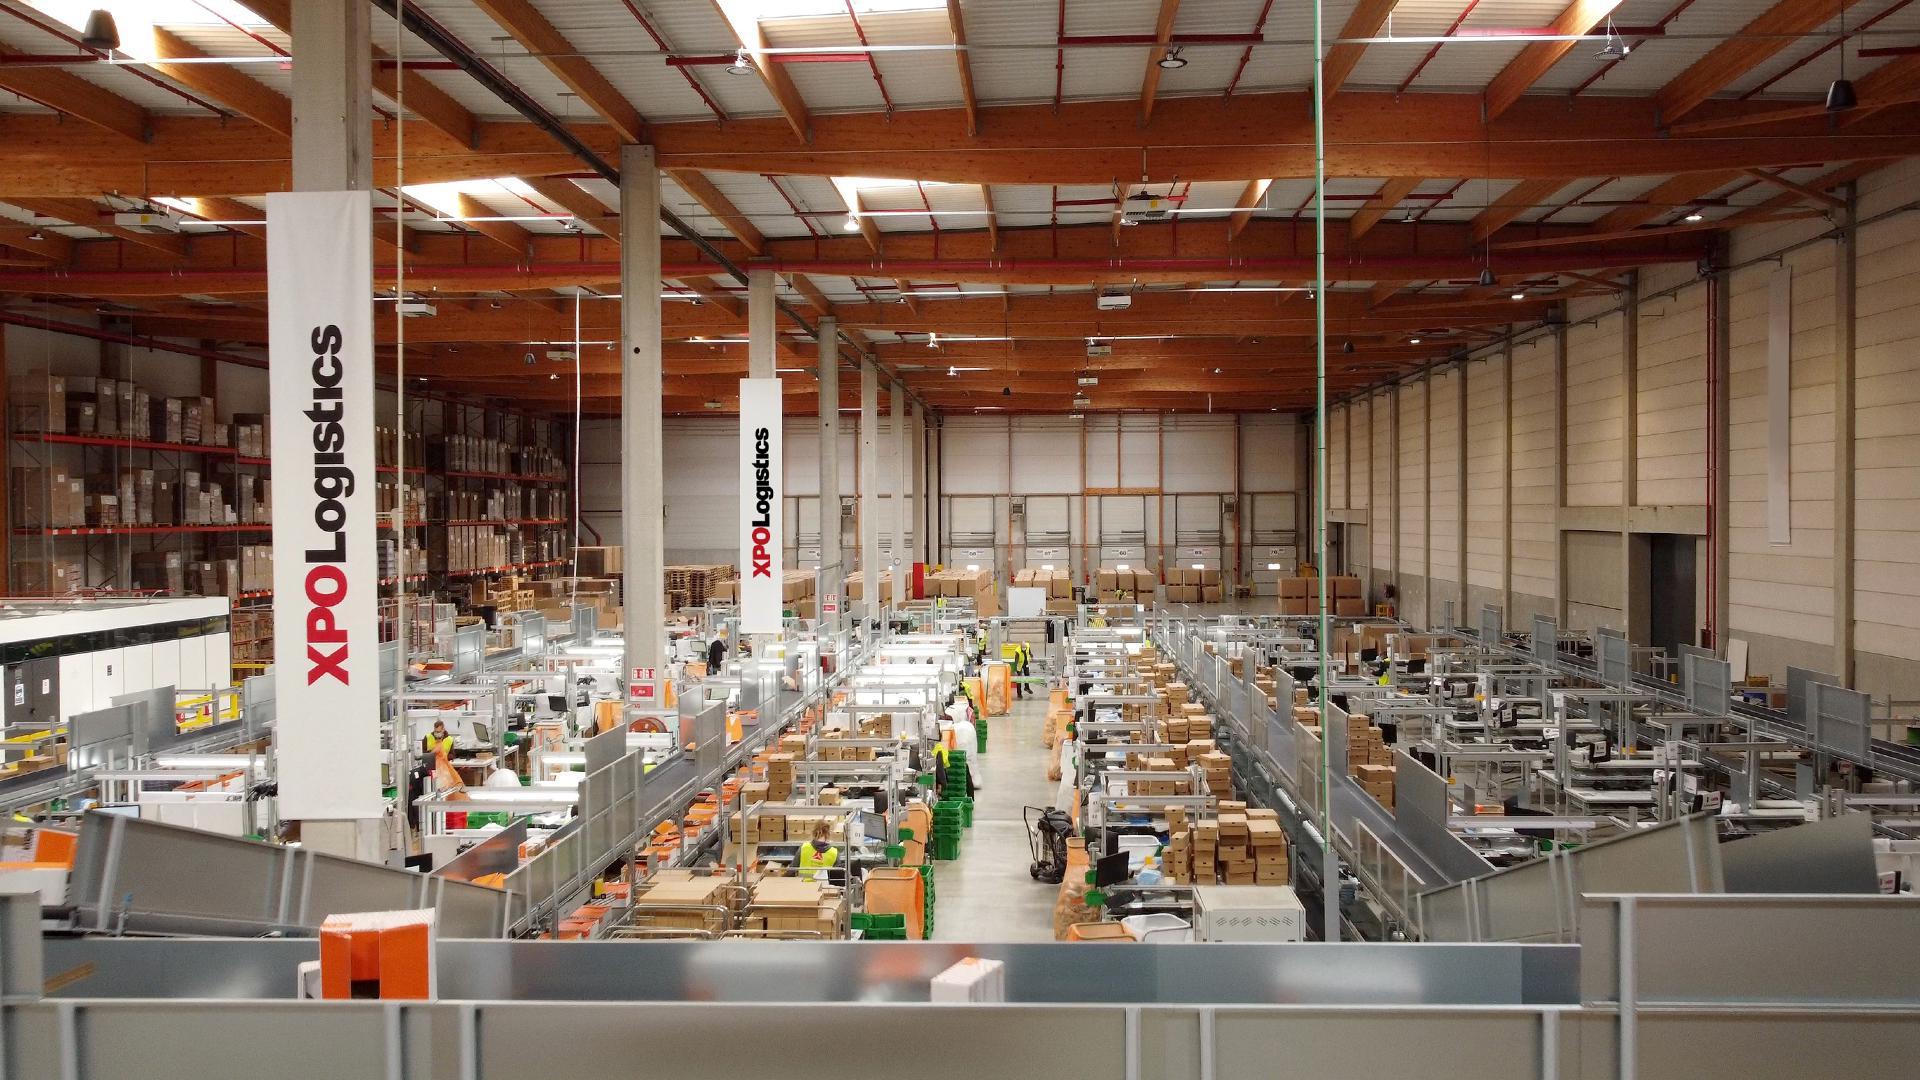 Automated line XPO warehouse